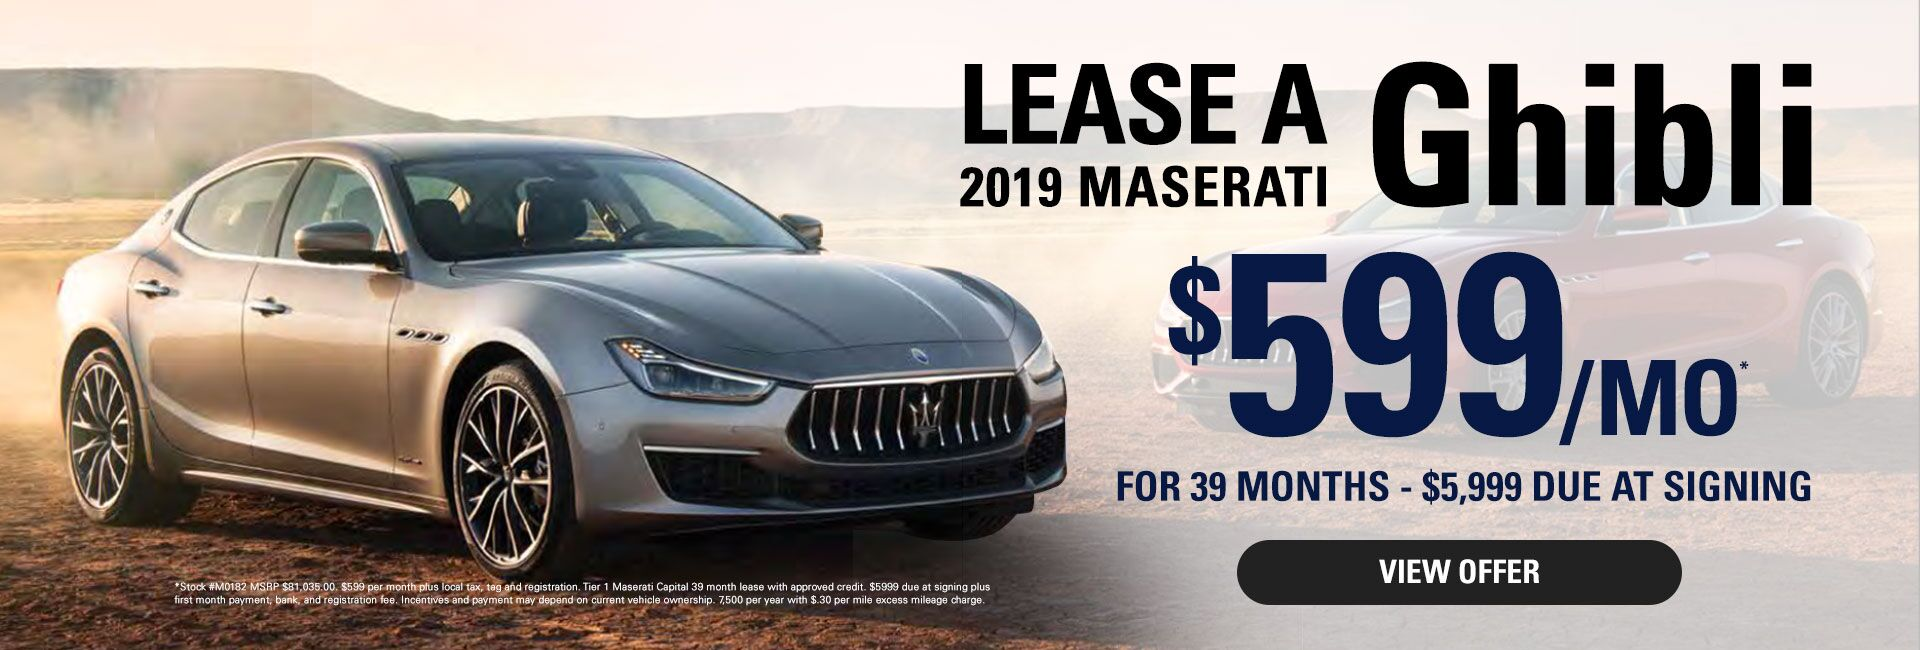 Car Rental Greenville Sc >> Maserati And Lotus Dealership Greenville Sc Used Cars